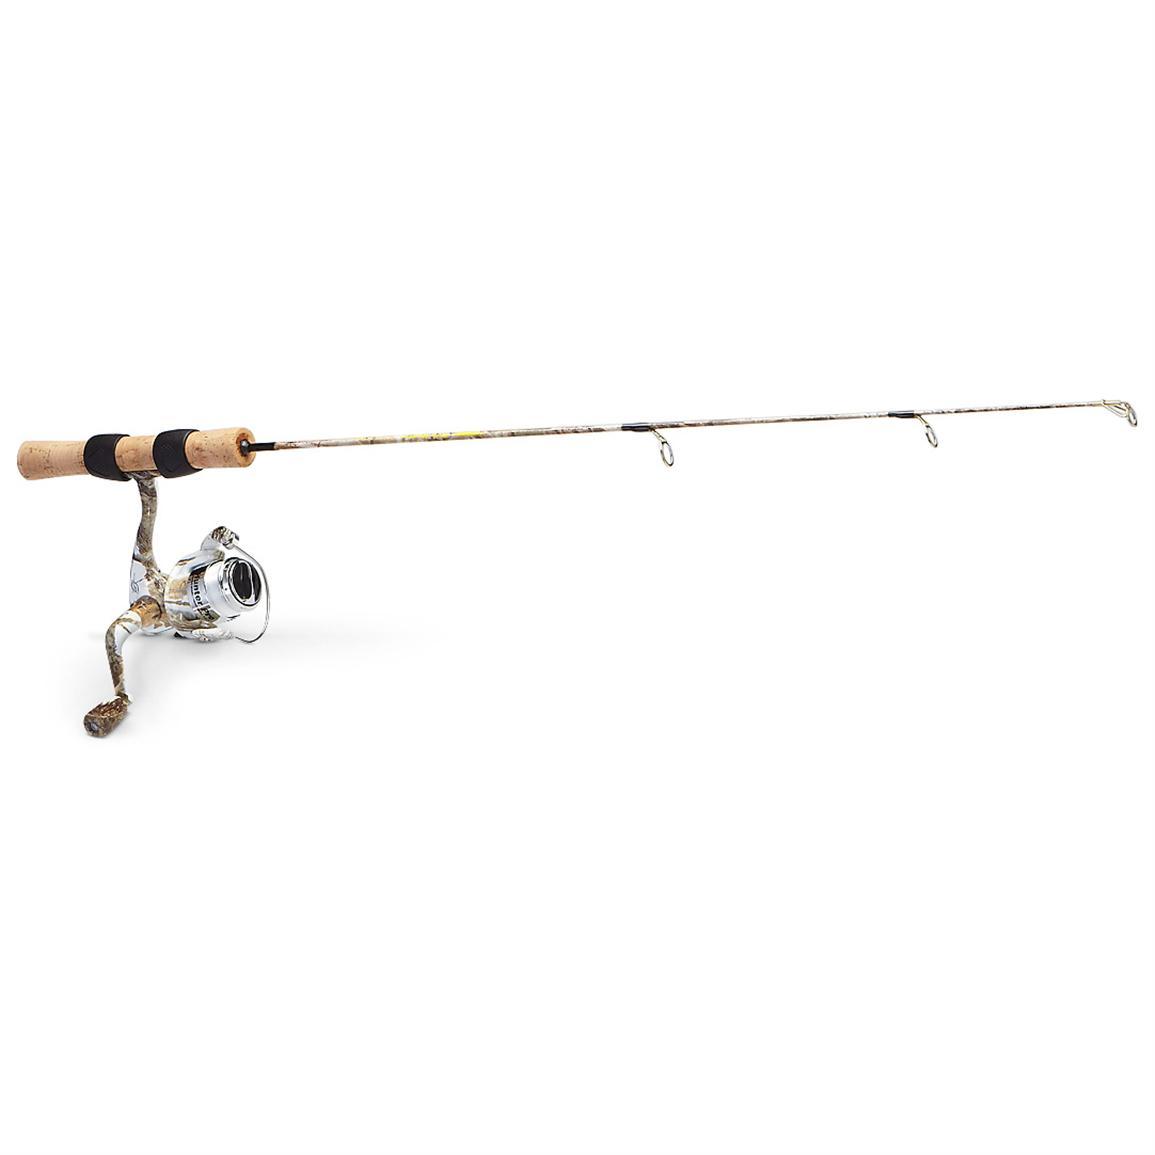 Fishing Rod clipart real Reel Fishing Camo Fishing Rod